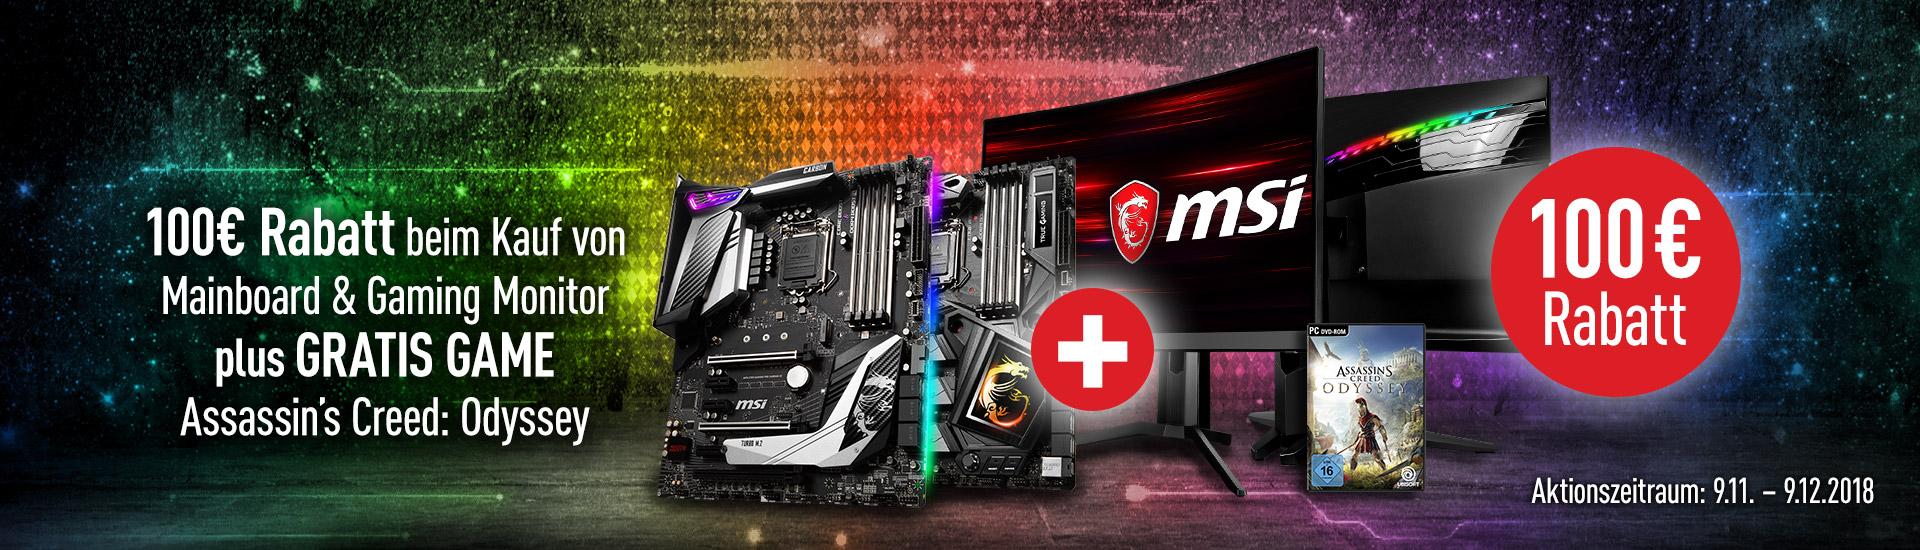 Rabatt für MSI MAG Curved Gaming Monitore